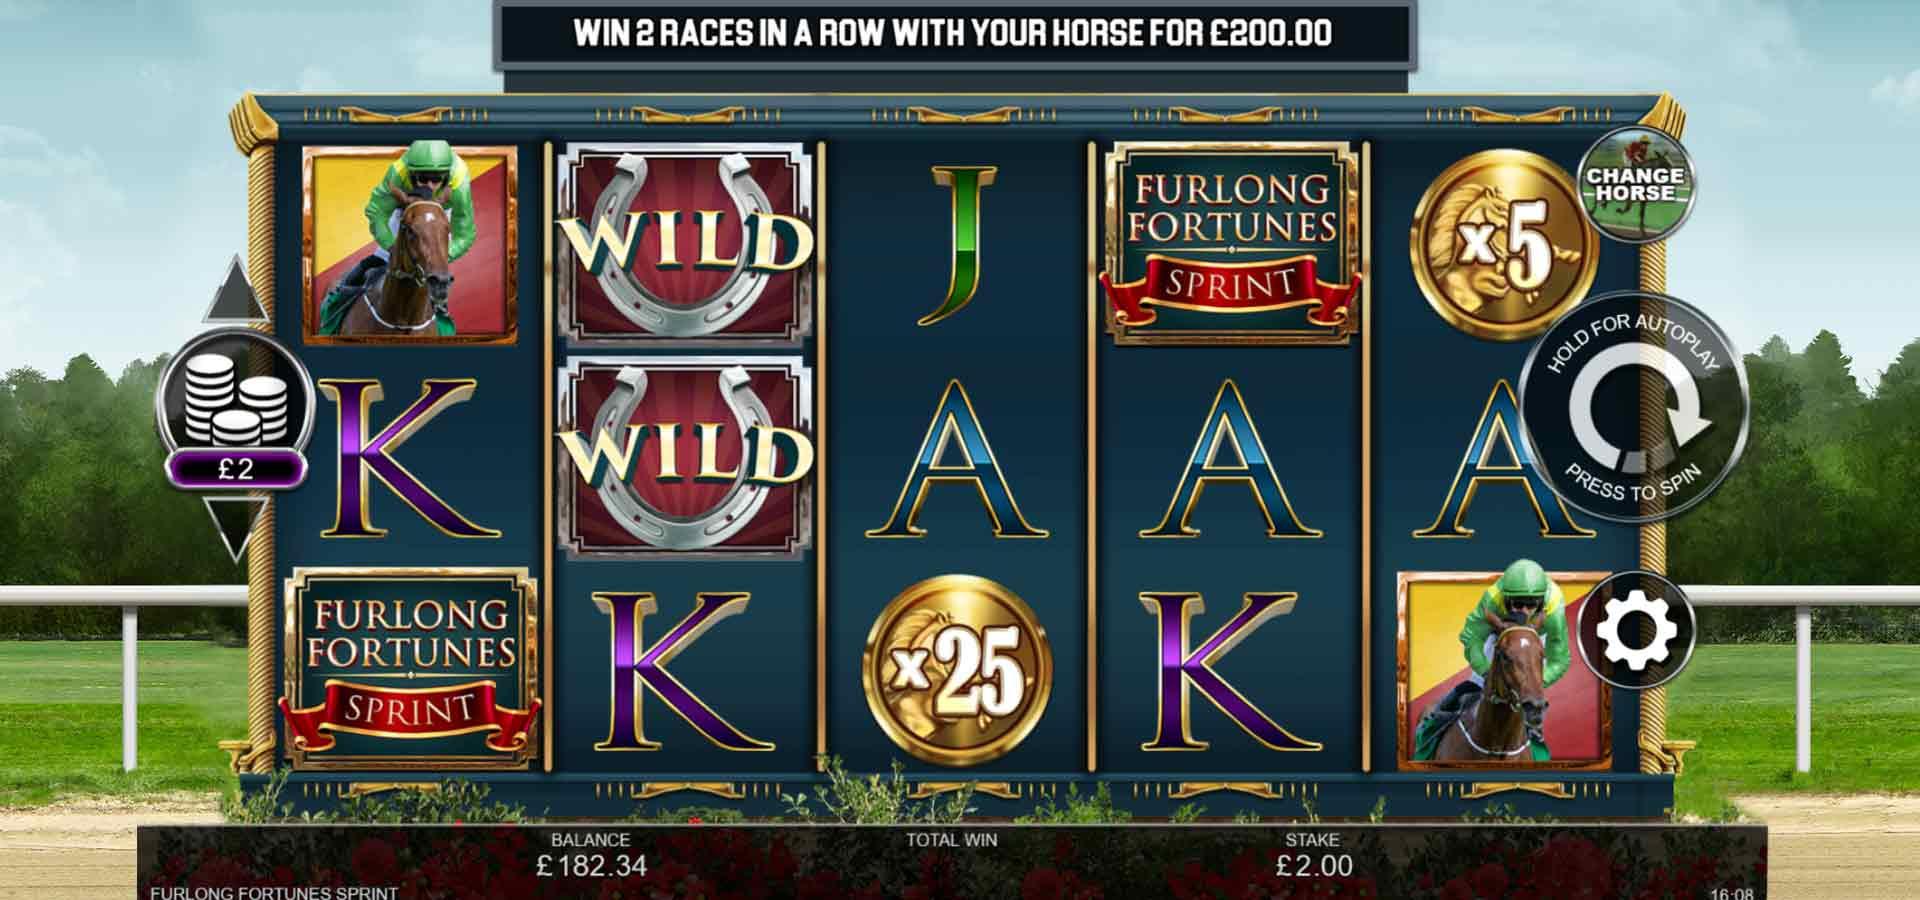 Spiele Furlong Fortunes Sprint - Video Slots Online